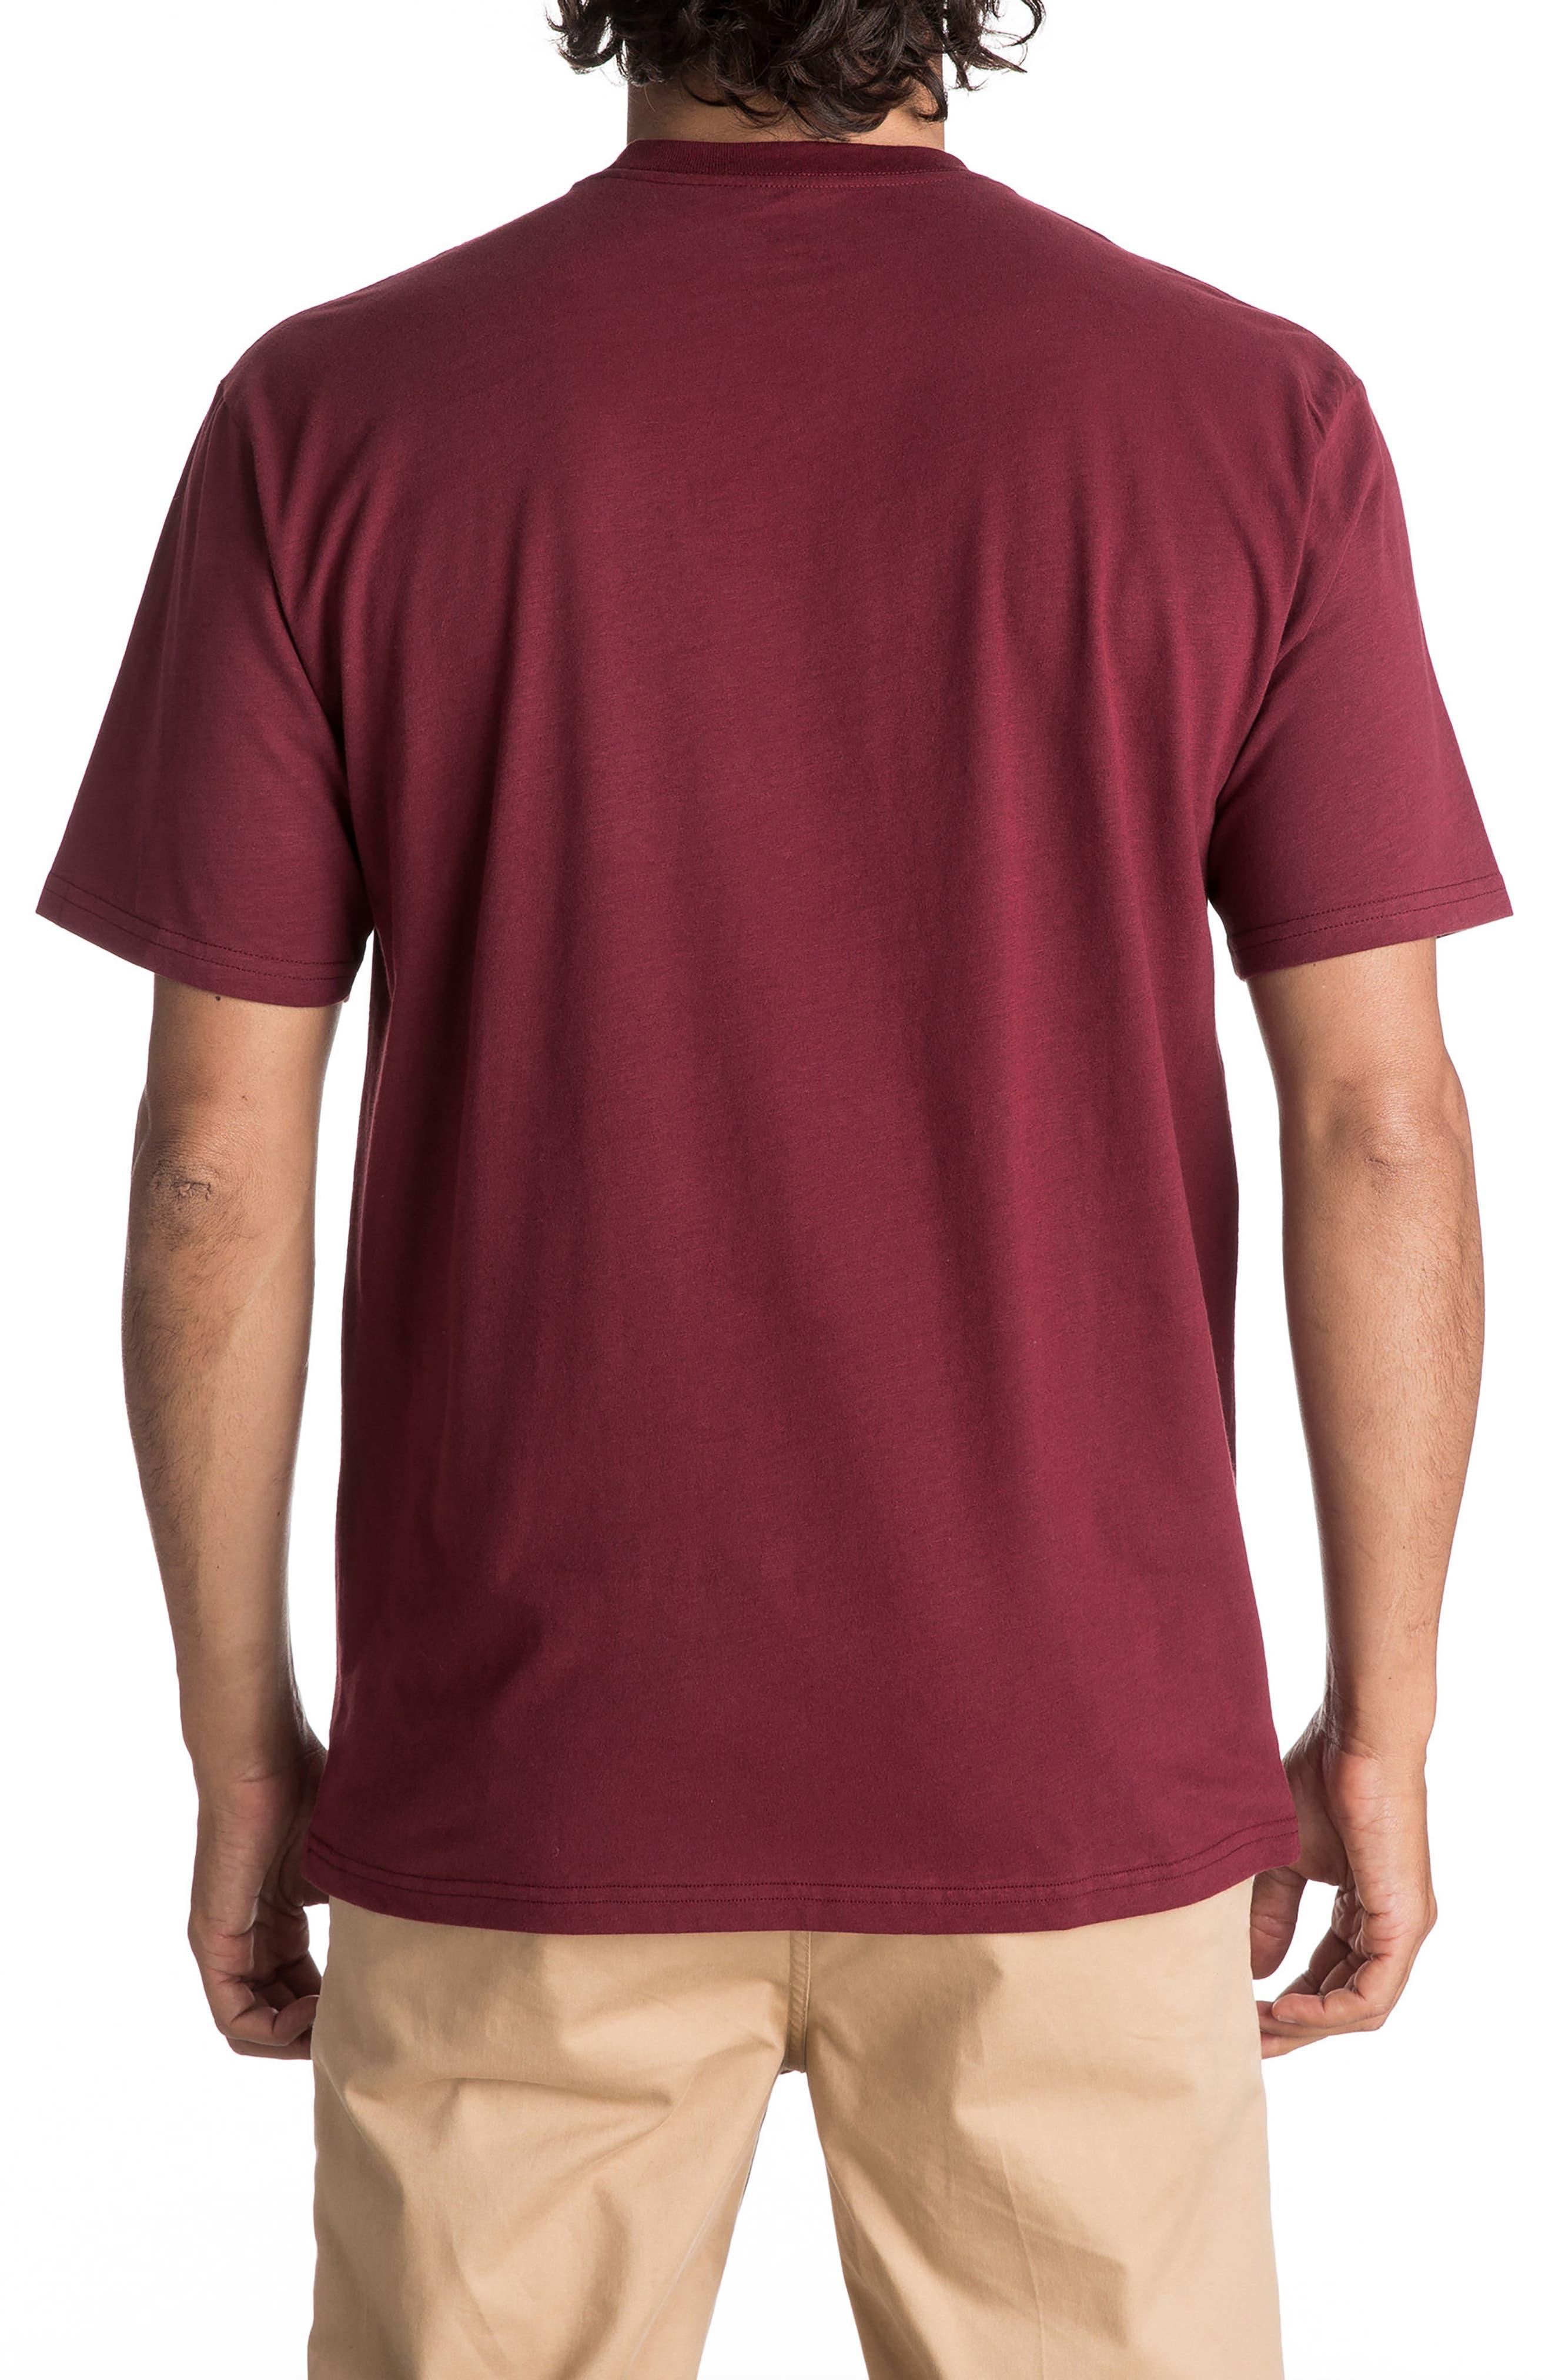 Wordmark T-Shirt,                             Alternate thumbnail 2, color,                             601